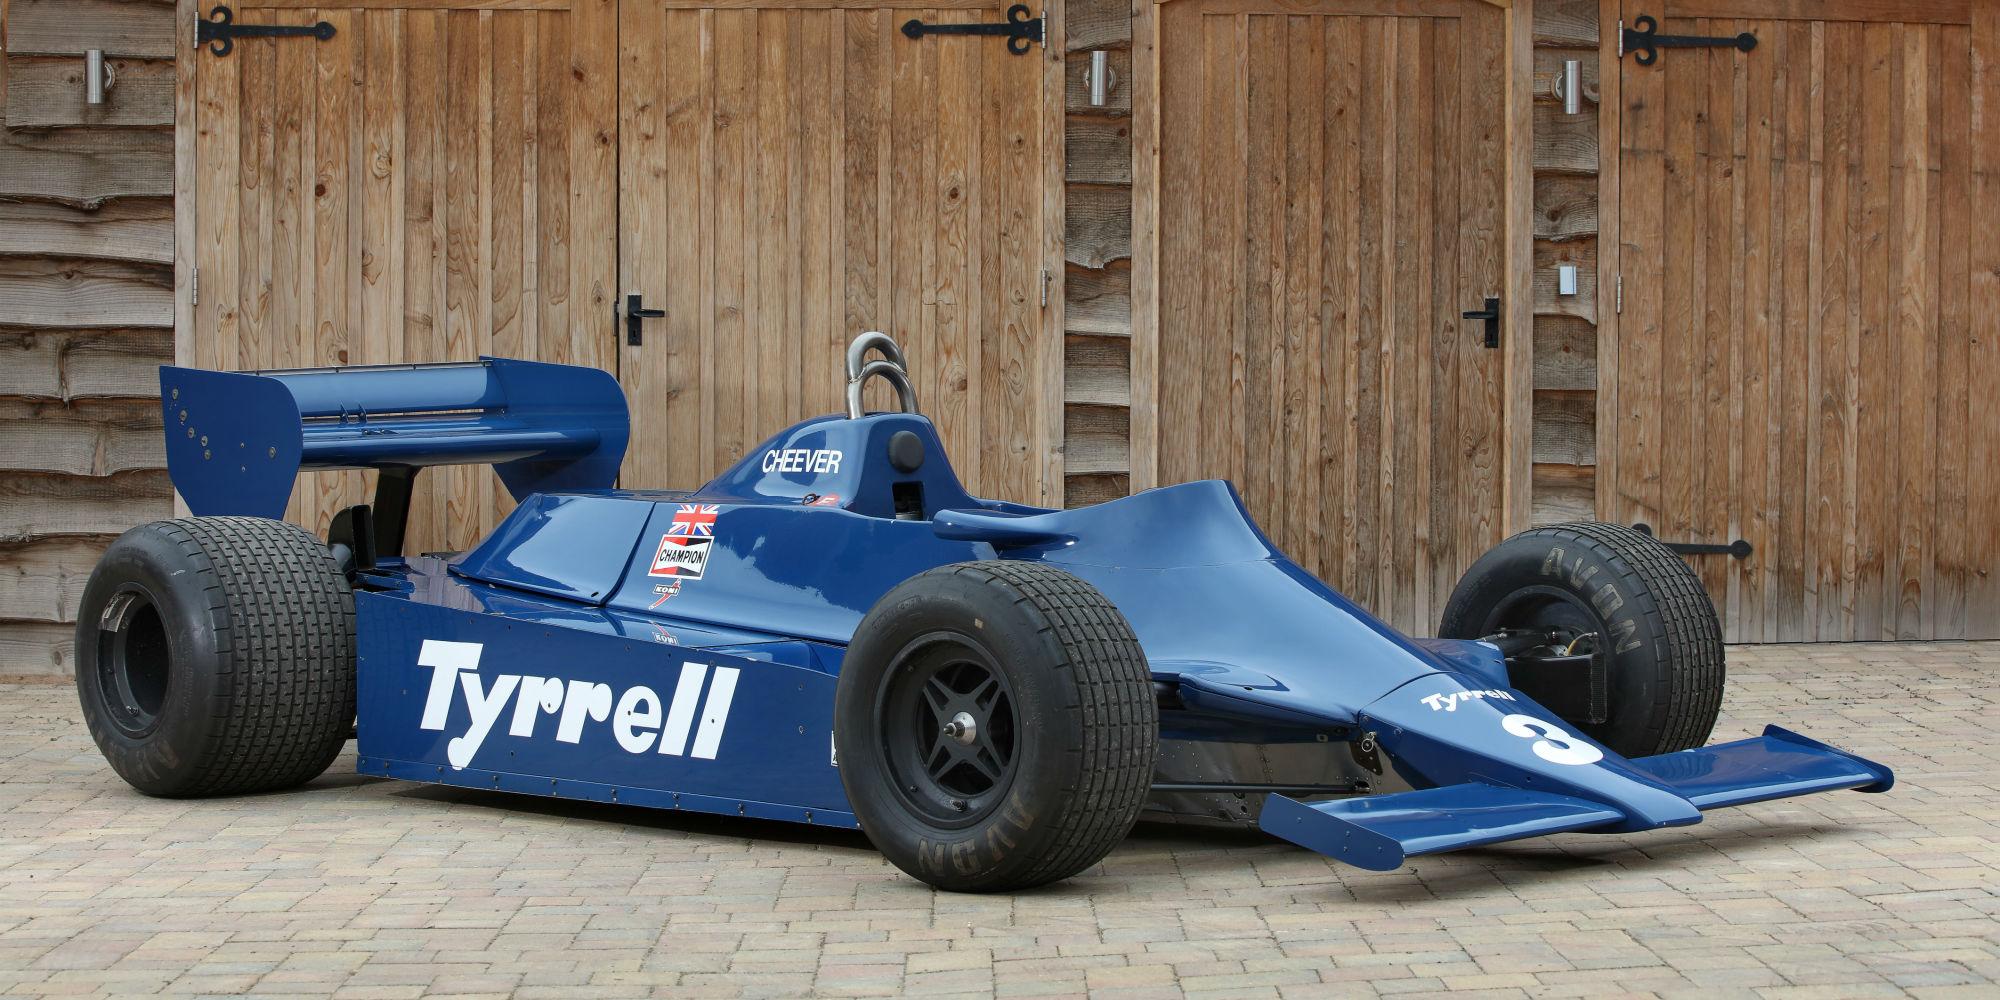 Tyrrell 010 Images Usseek Com